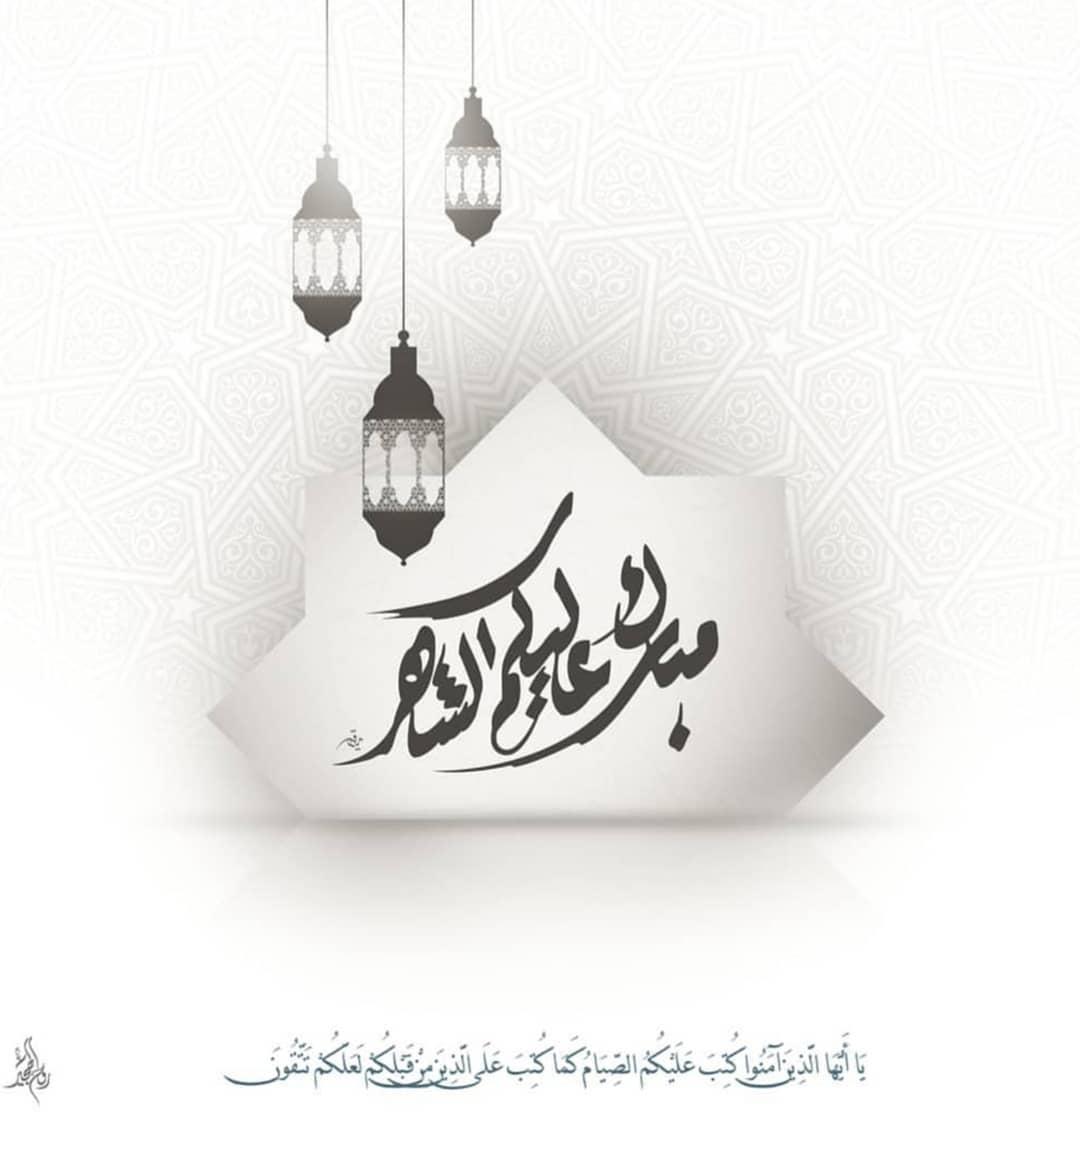 aksneveshte mahe ramazan beitezohoor.ir 1 - دانلود عکس ماه رمضان برای پروفایل